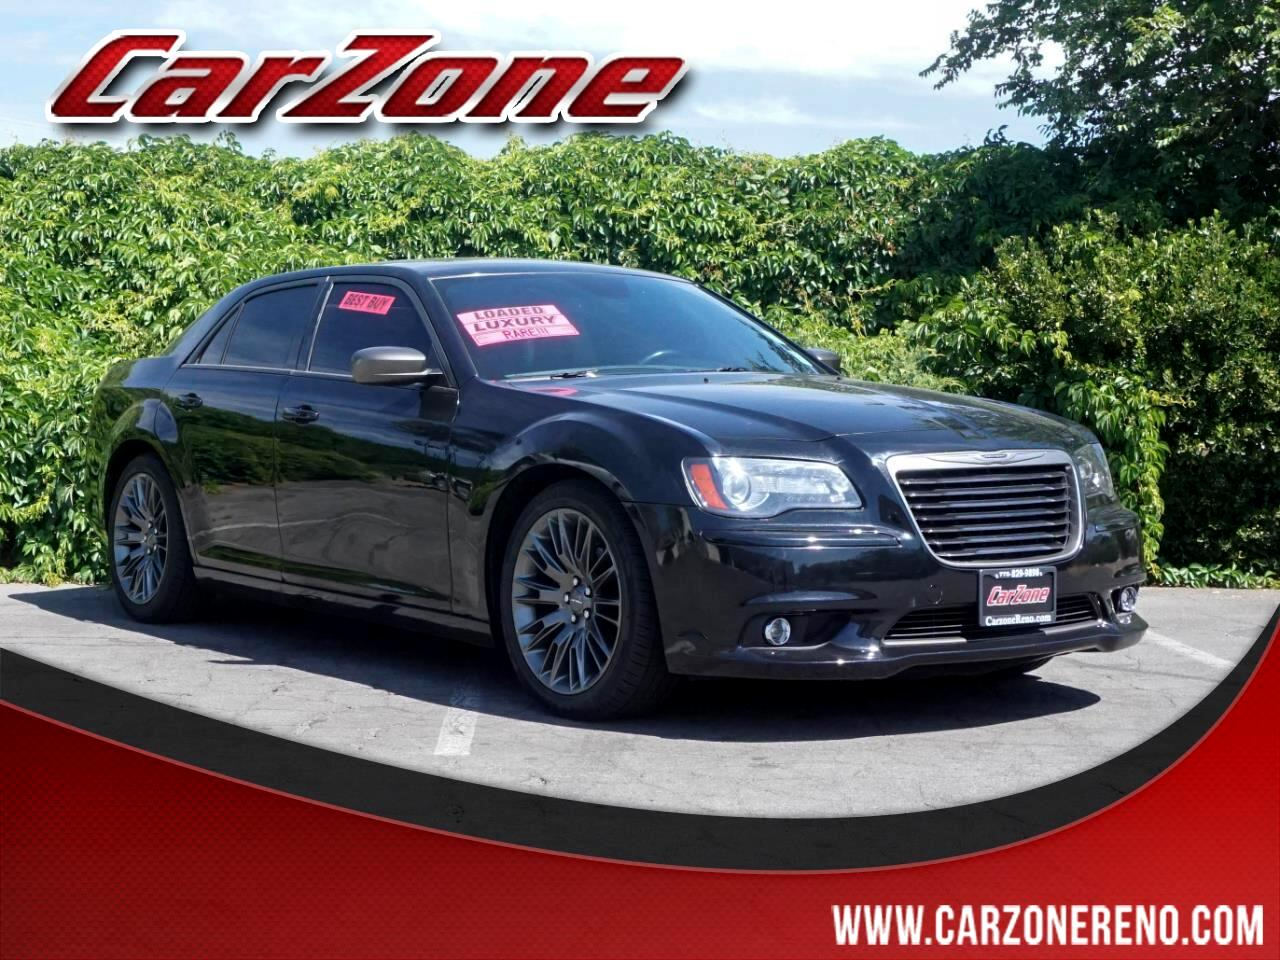 2013 Chrysler 300 4dr Sdn 300C John Varvatos Limited Edition RWD